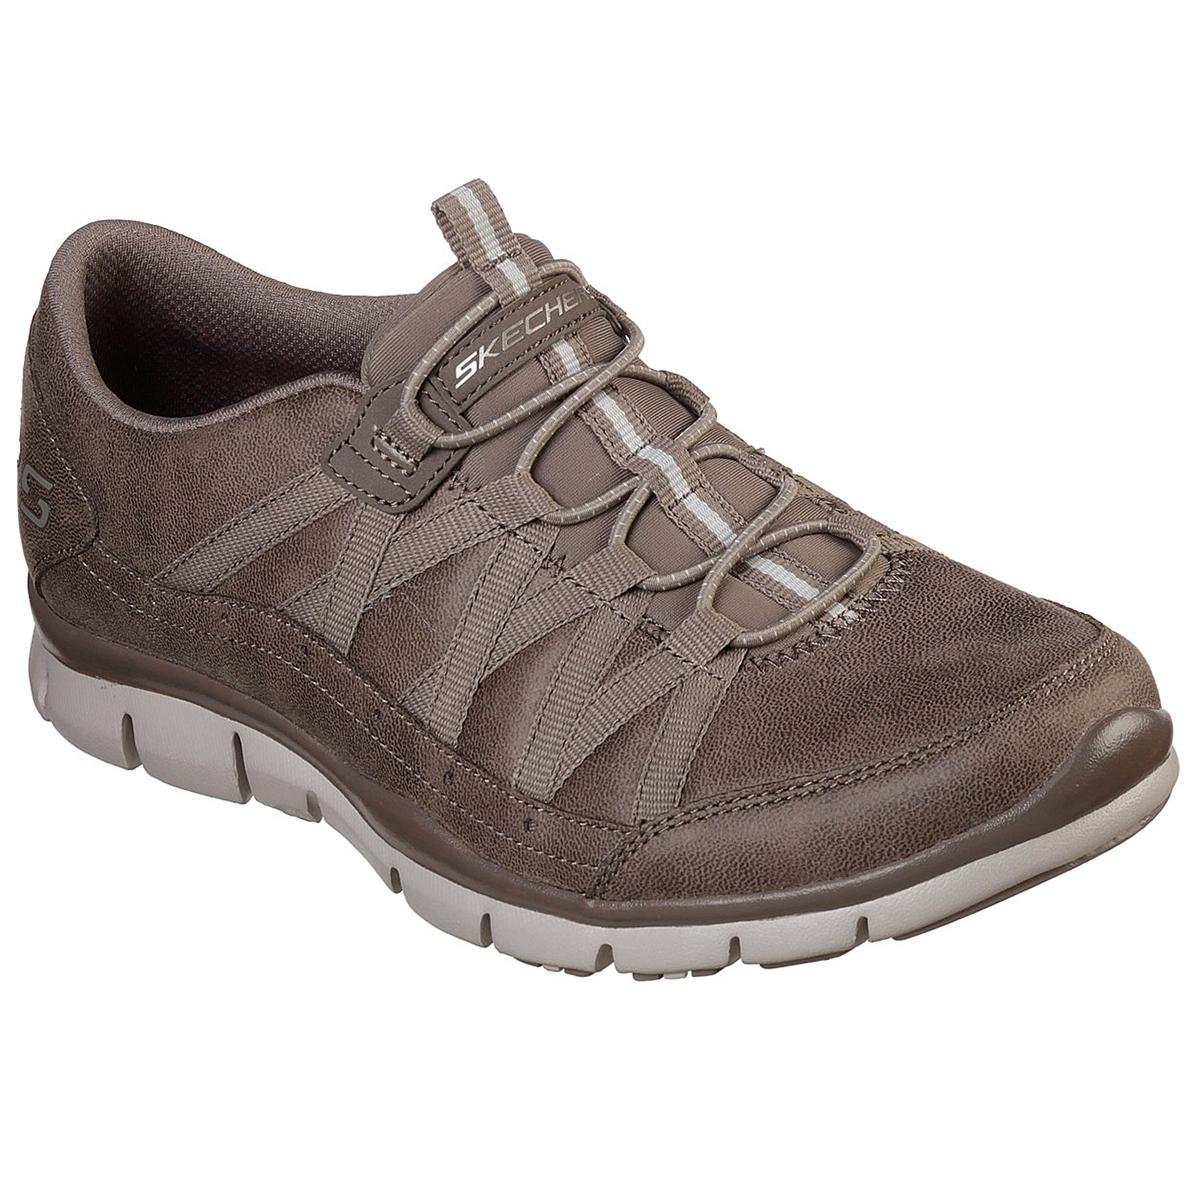 Skechers Women's Gratis Casual Slip On Shoes - Brown, 7